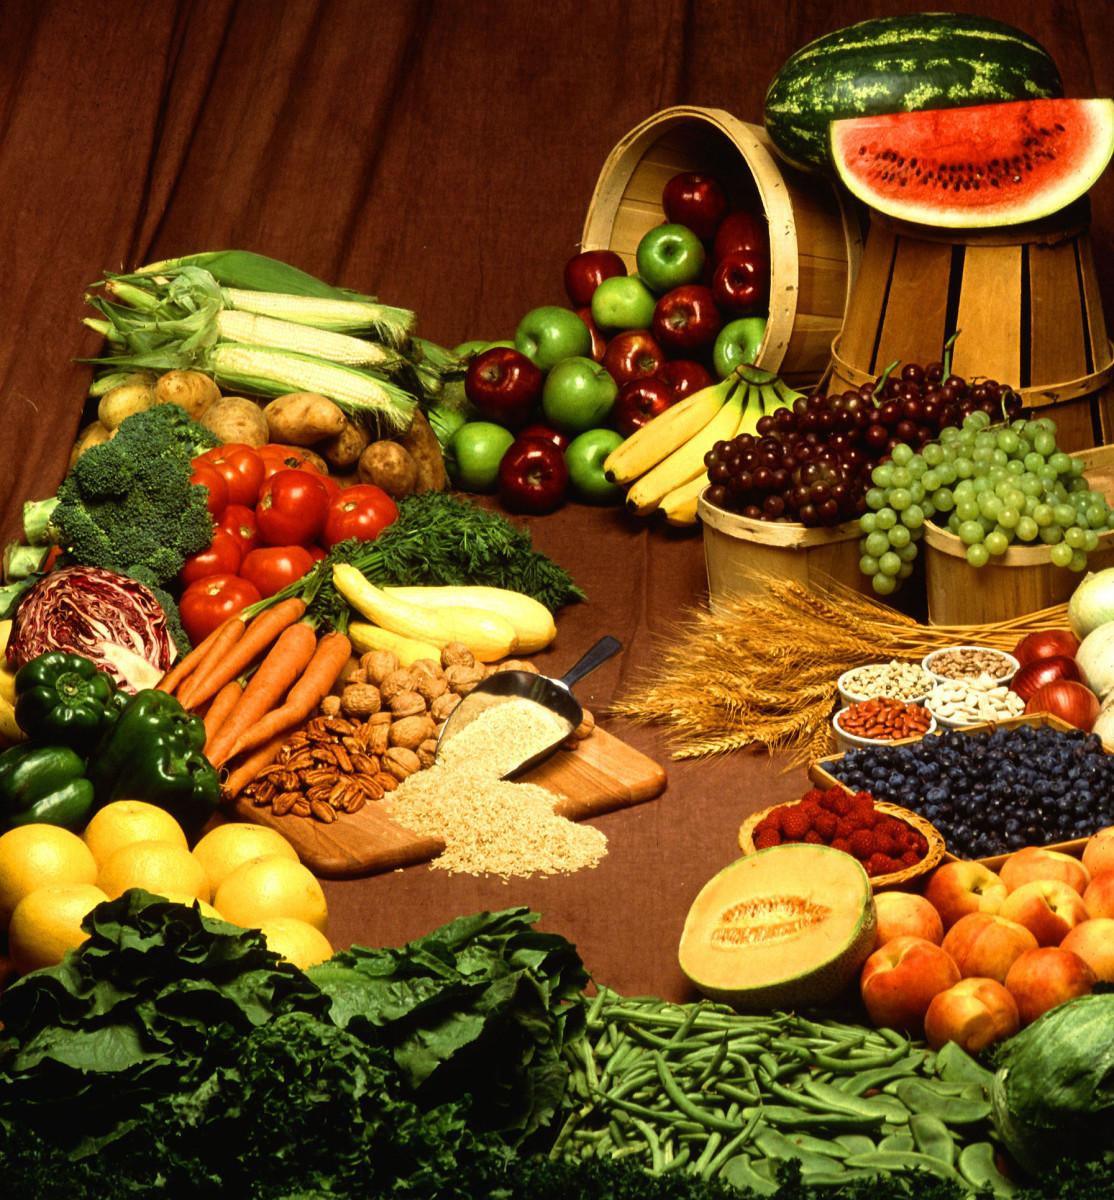 High-Fiber-Content Foods: Fruits, Vegetables, and Cereals